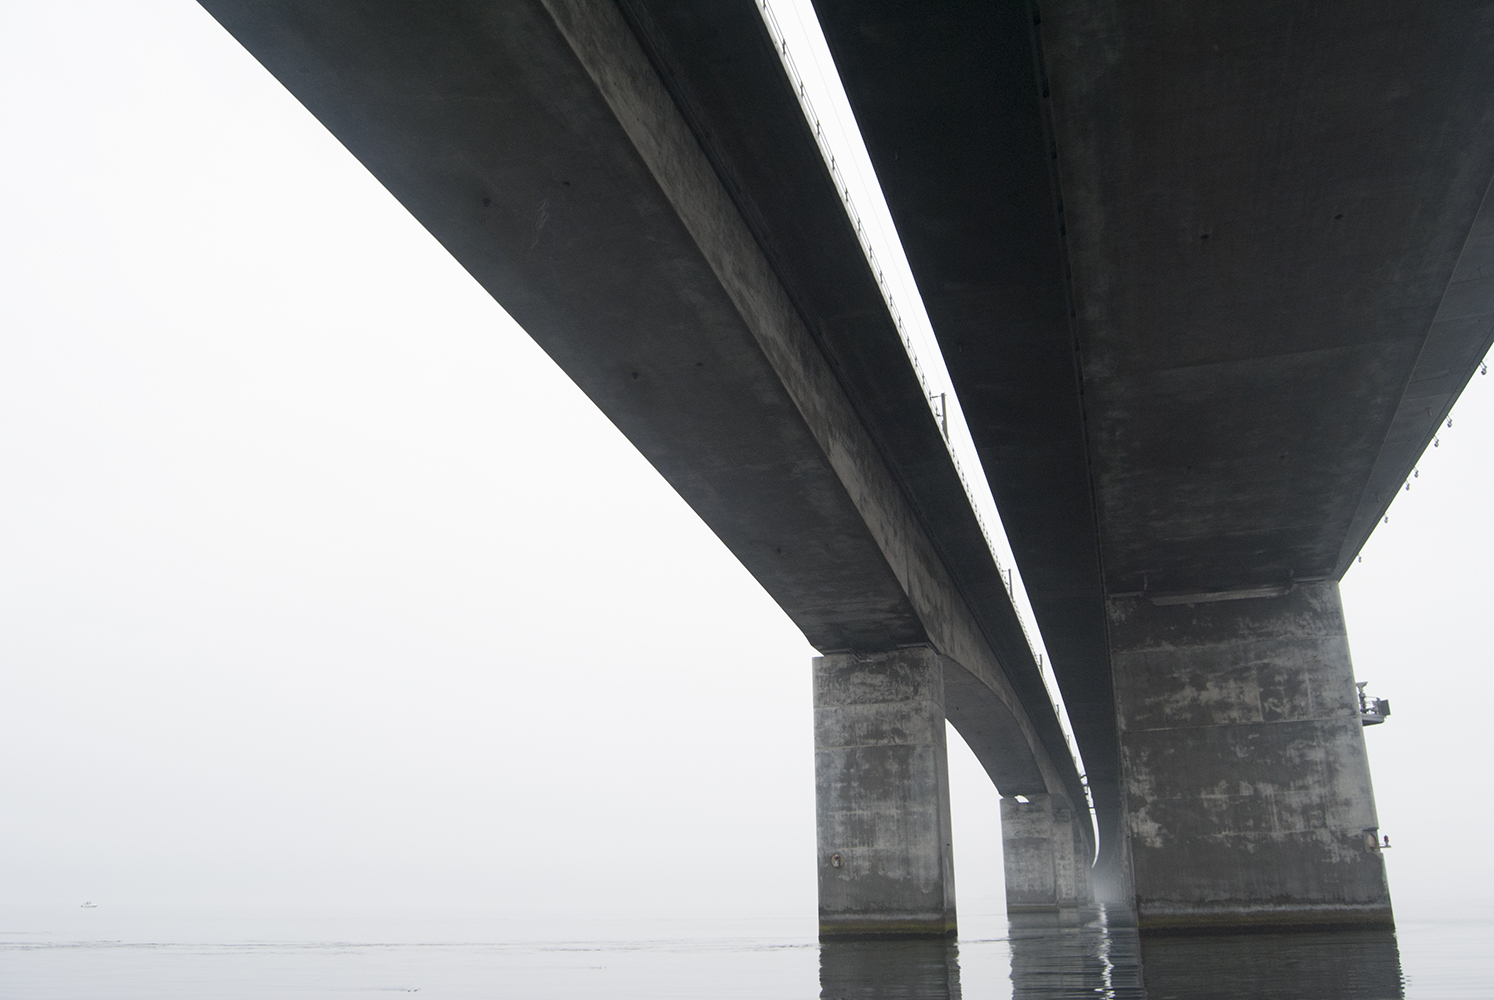 Under storebæltsbro